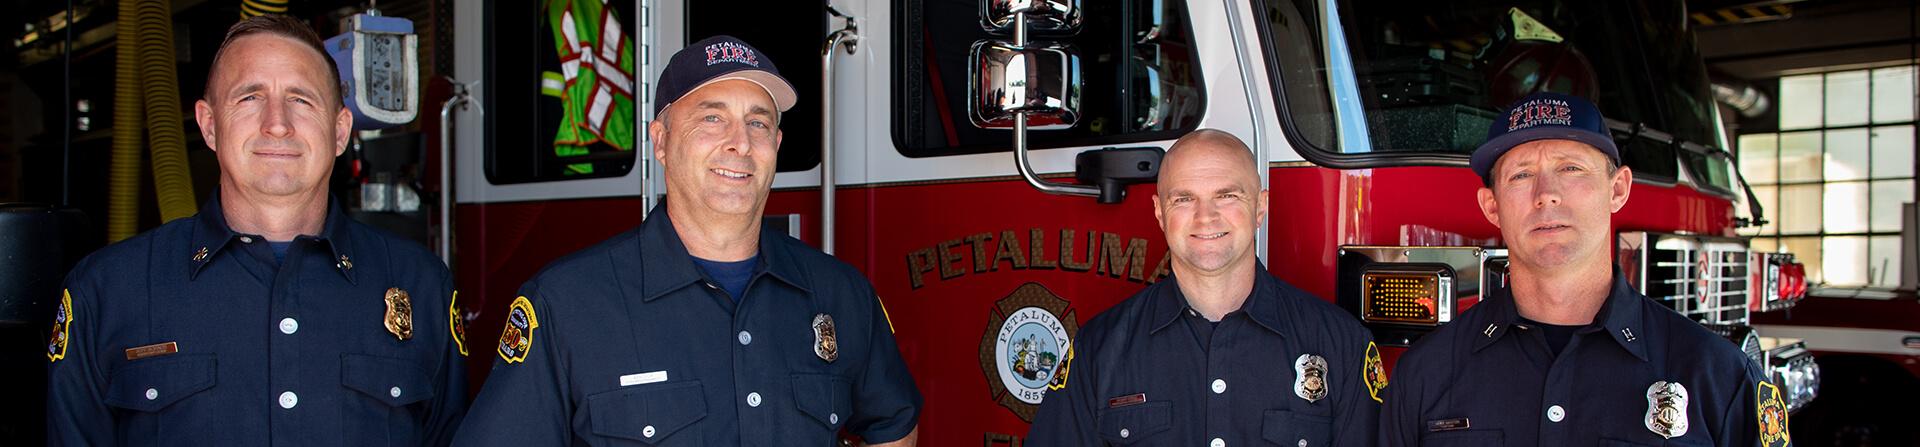 banner image of firemen